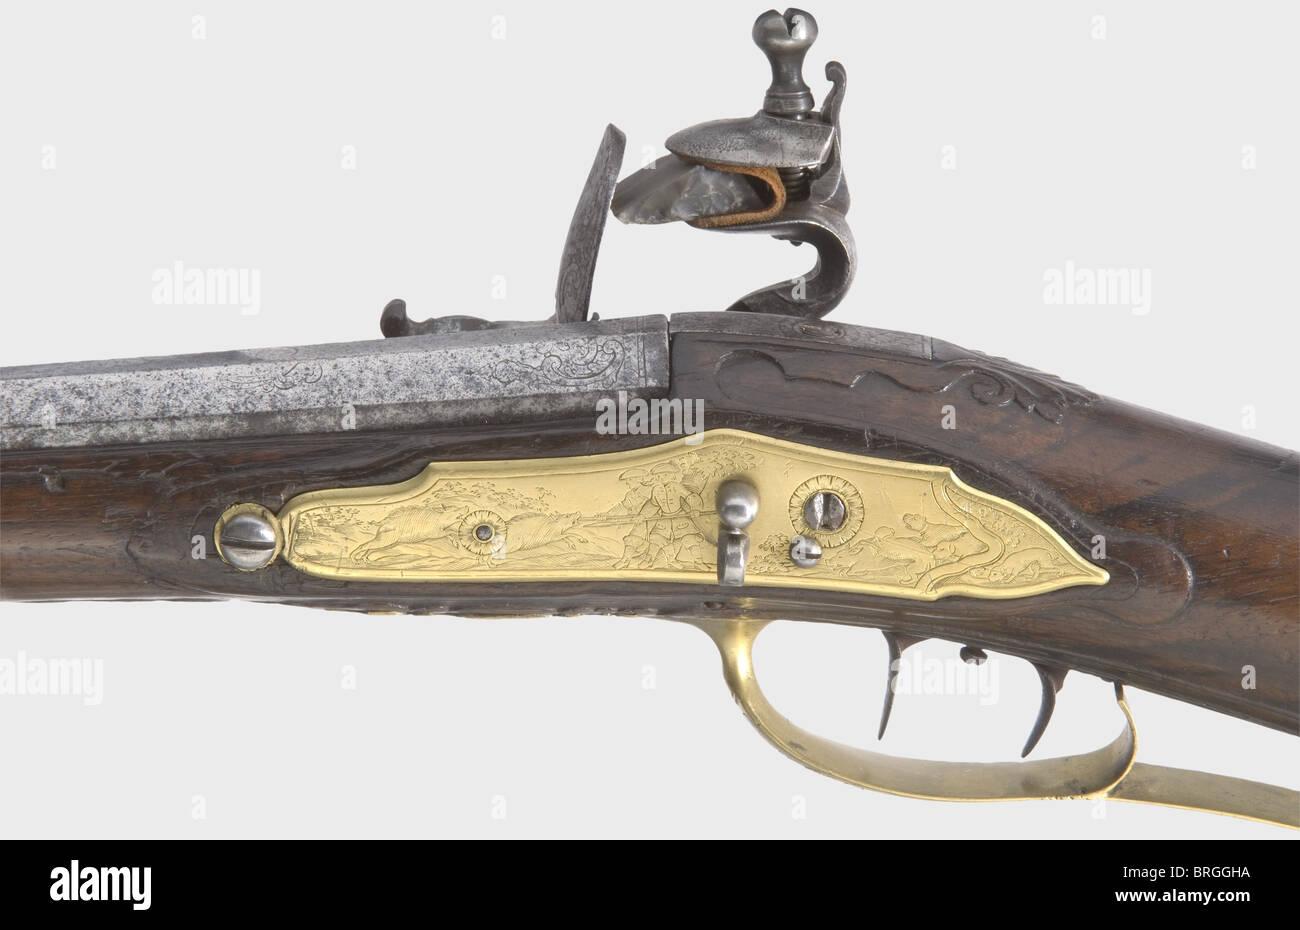 A combined flintlock/air gun, Wentzlau, Neuwied, circa 1740. Octagonal barrel becoming round with a smooth bore - Stock Image